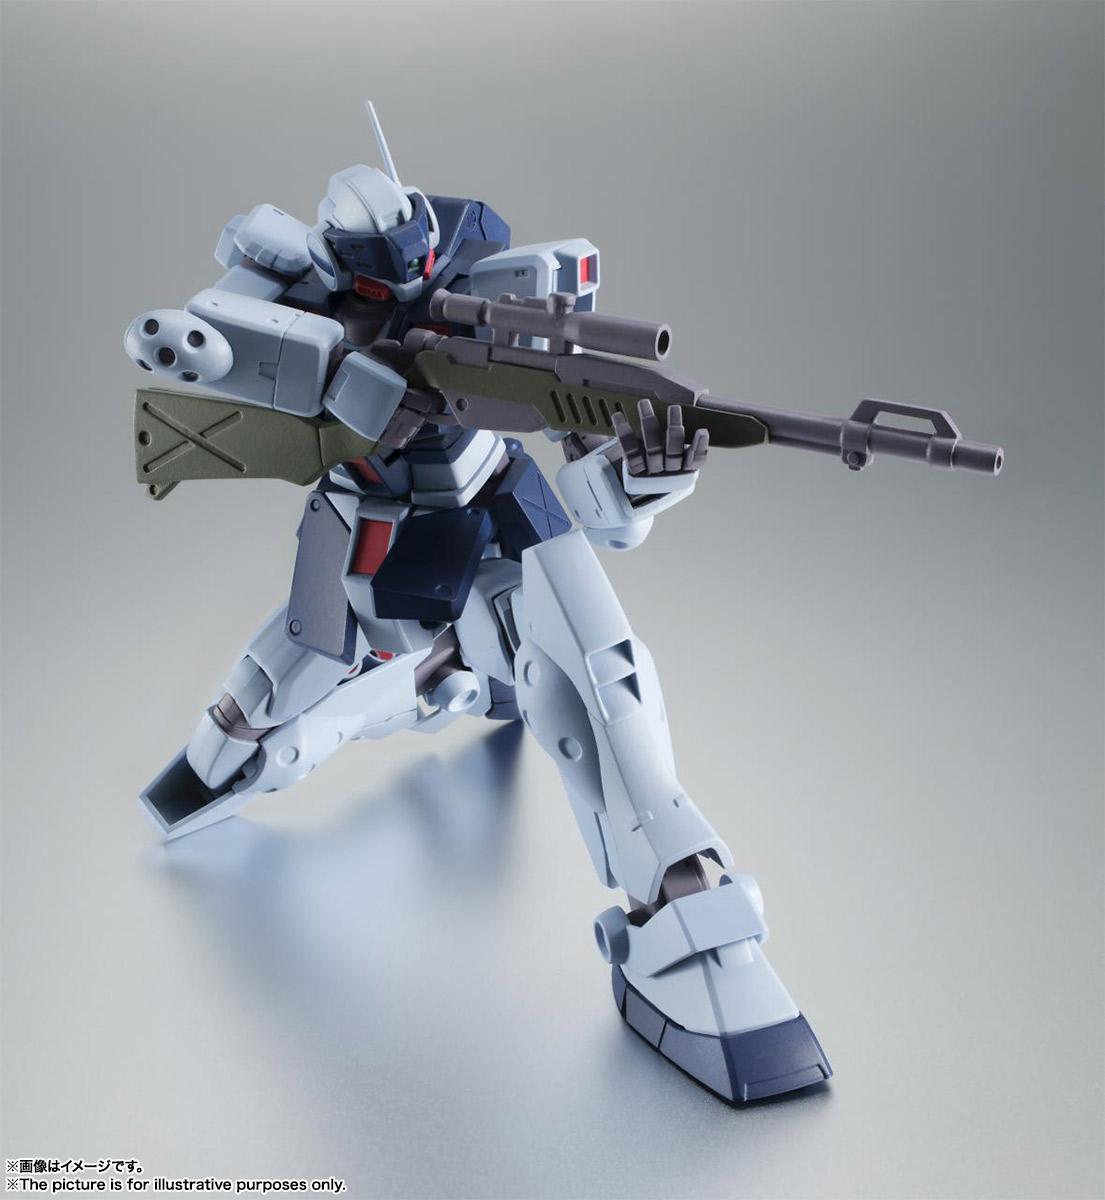 ROBOT魂 <SIDE MS> 『機動戦士ガンダム0080 ポケットの中の戦争』 RGM-79SP ジム・スナイパーII ver. A.N.I.M.E.